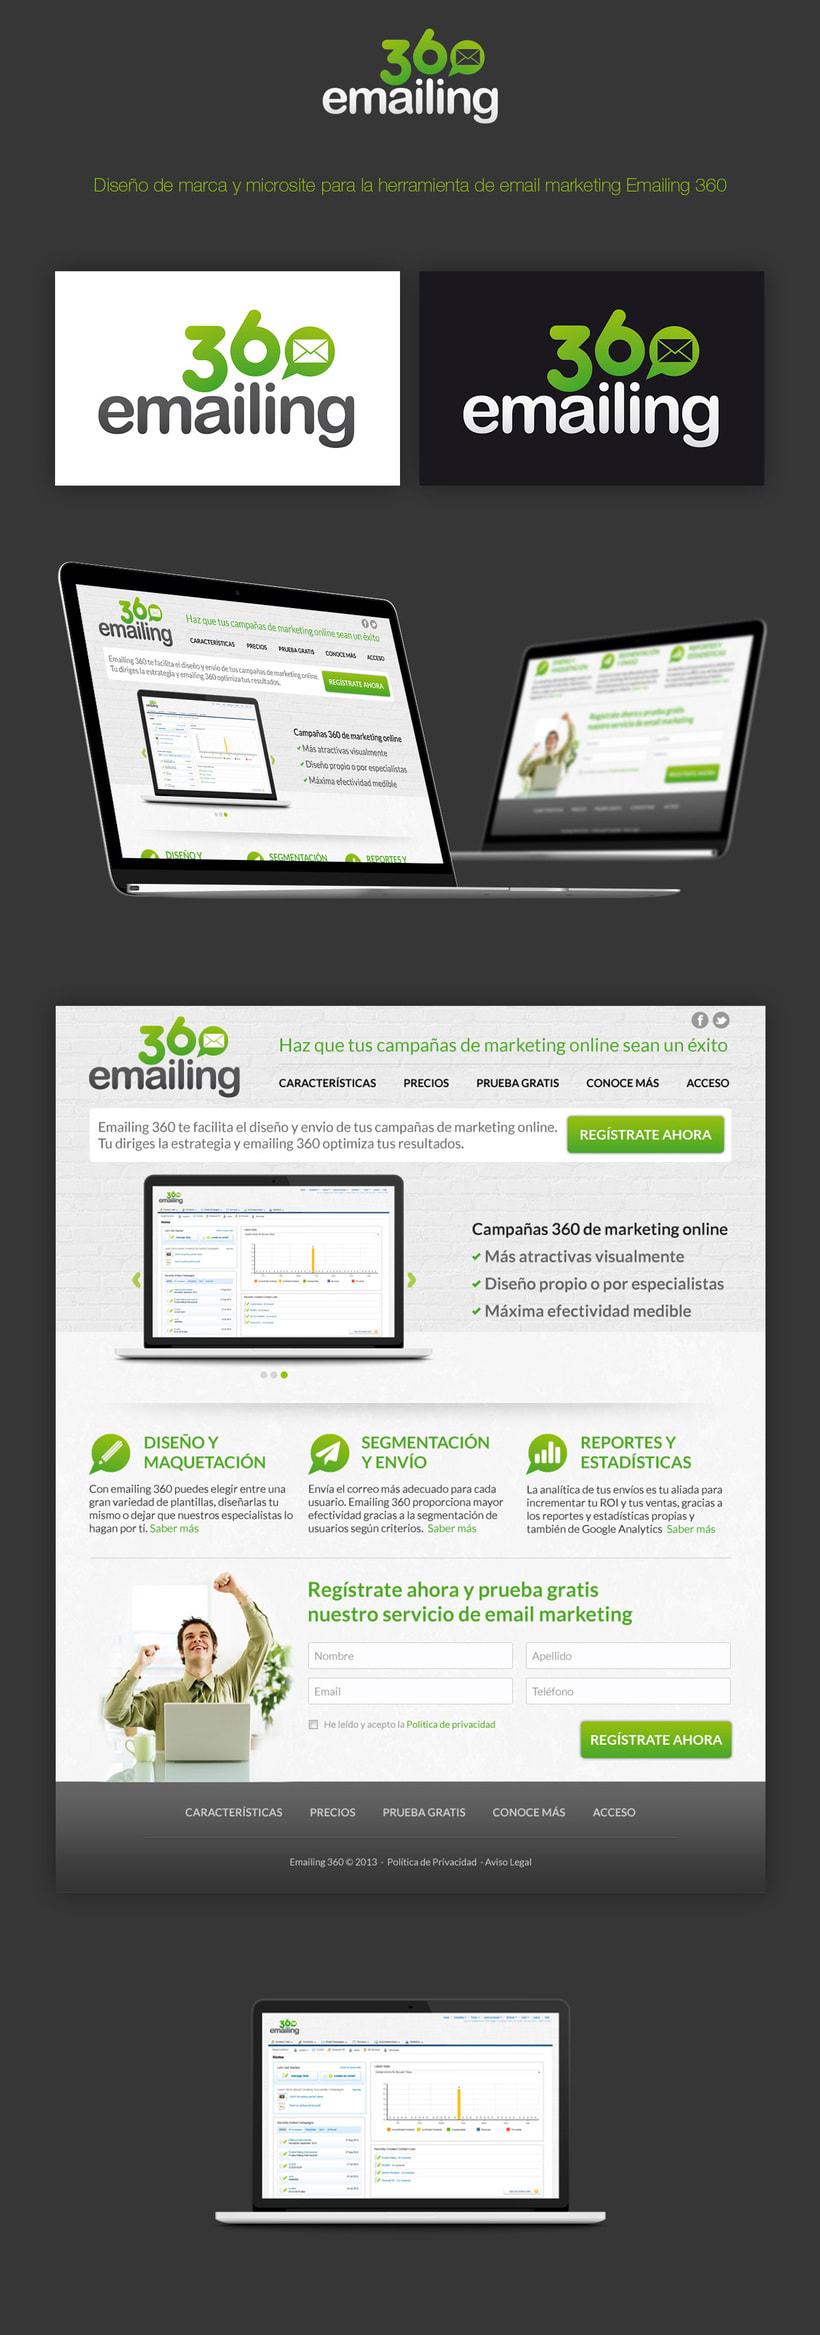 Emailing 360 | Branding + Microsite -1